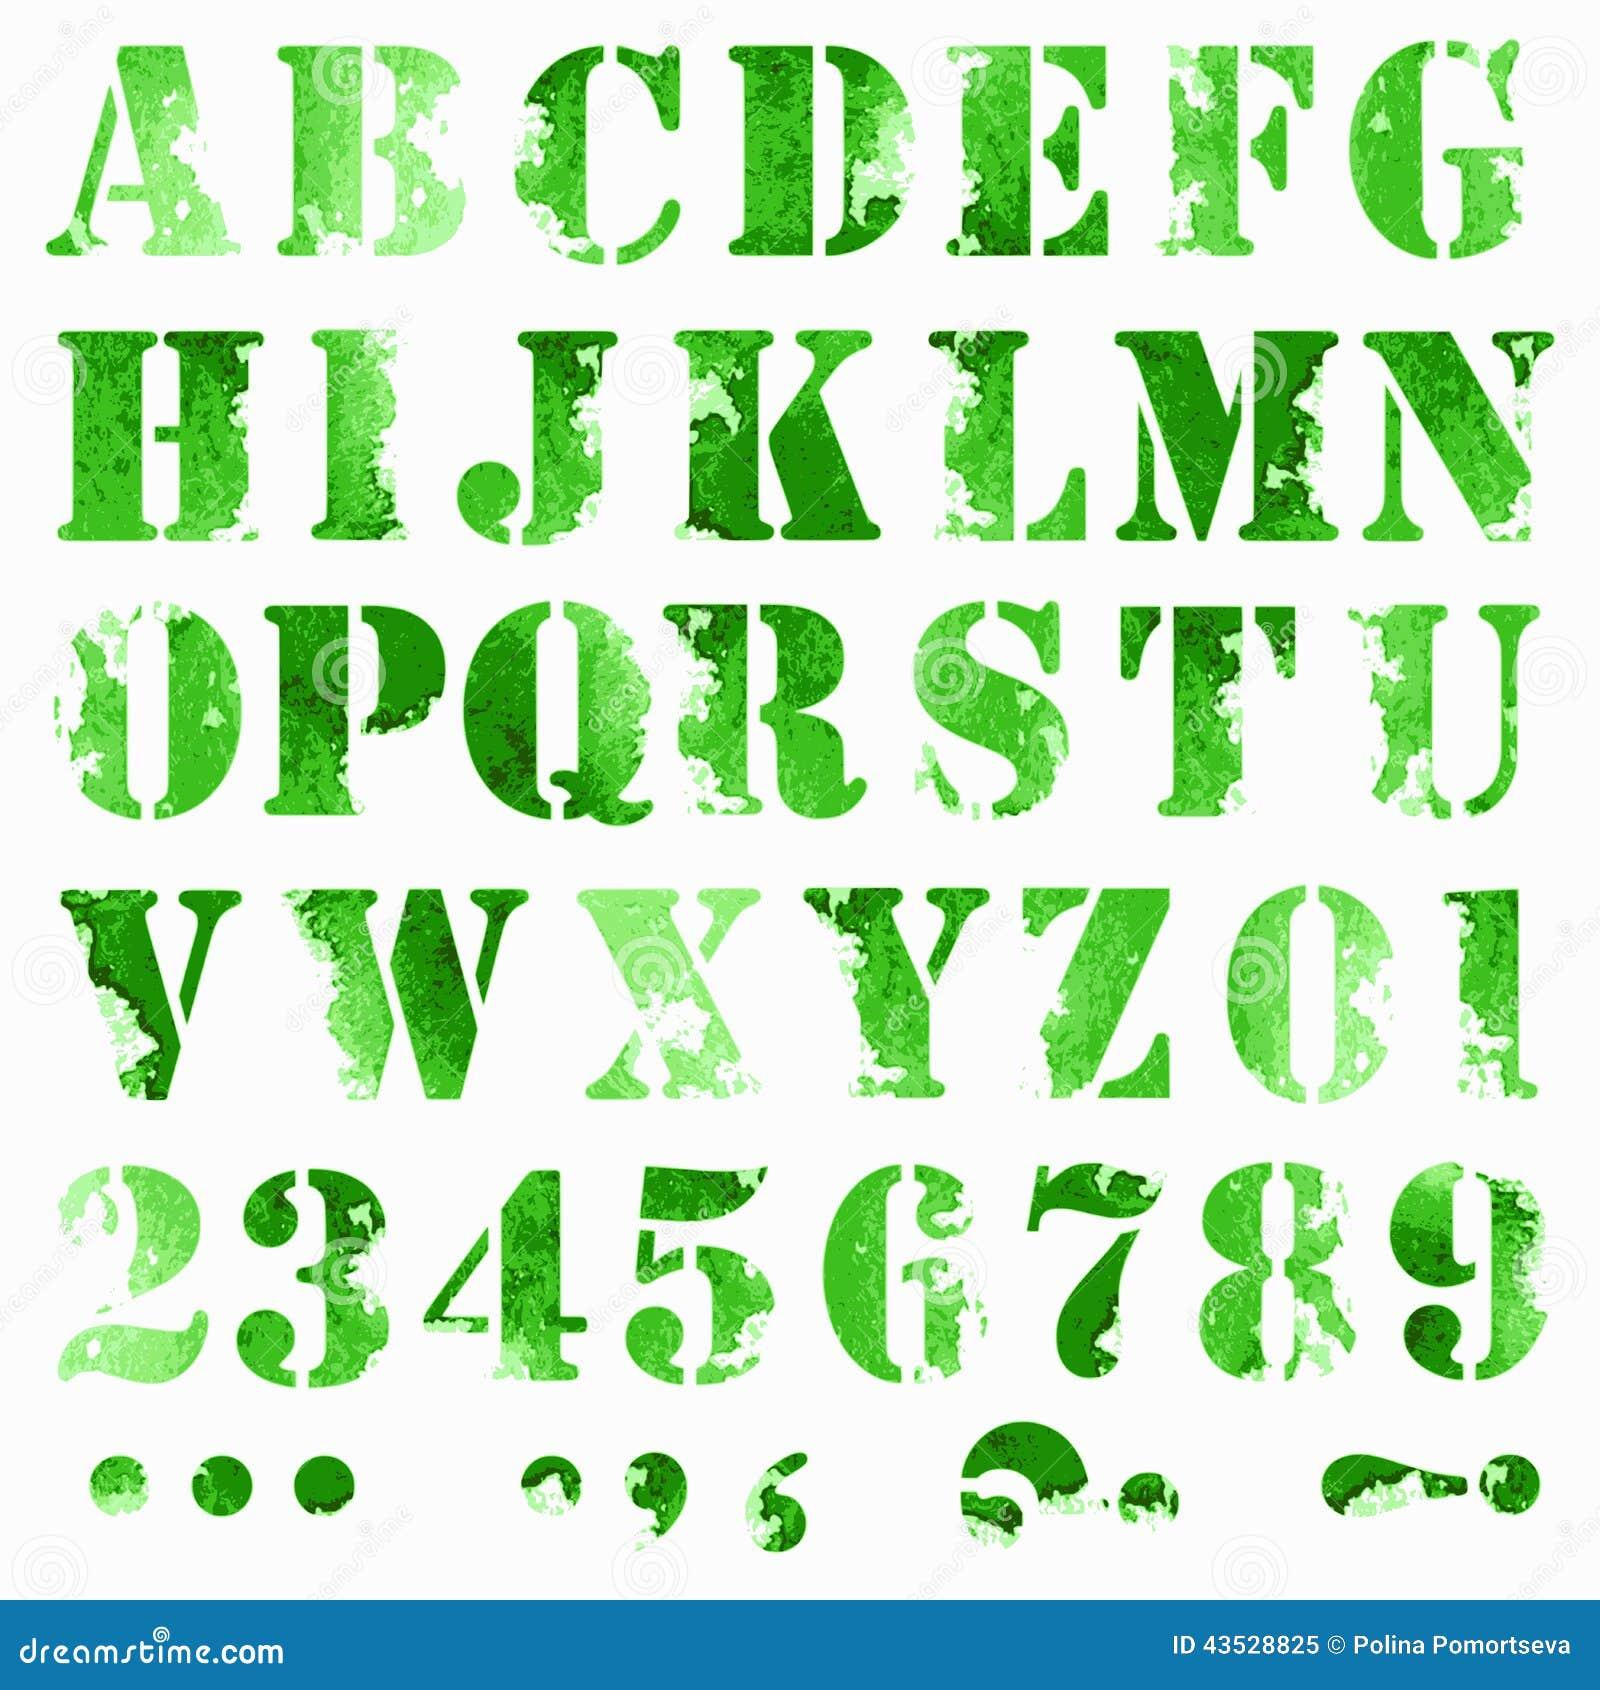 Watercolor letters stock vector  Illustration of graffiti - 43528825